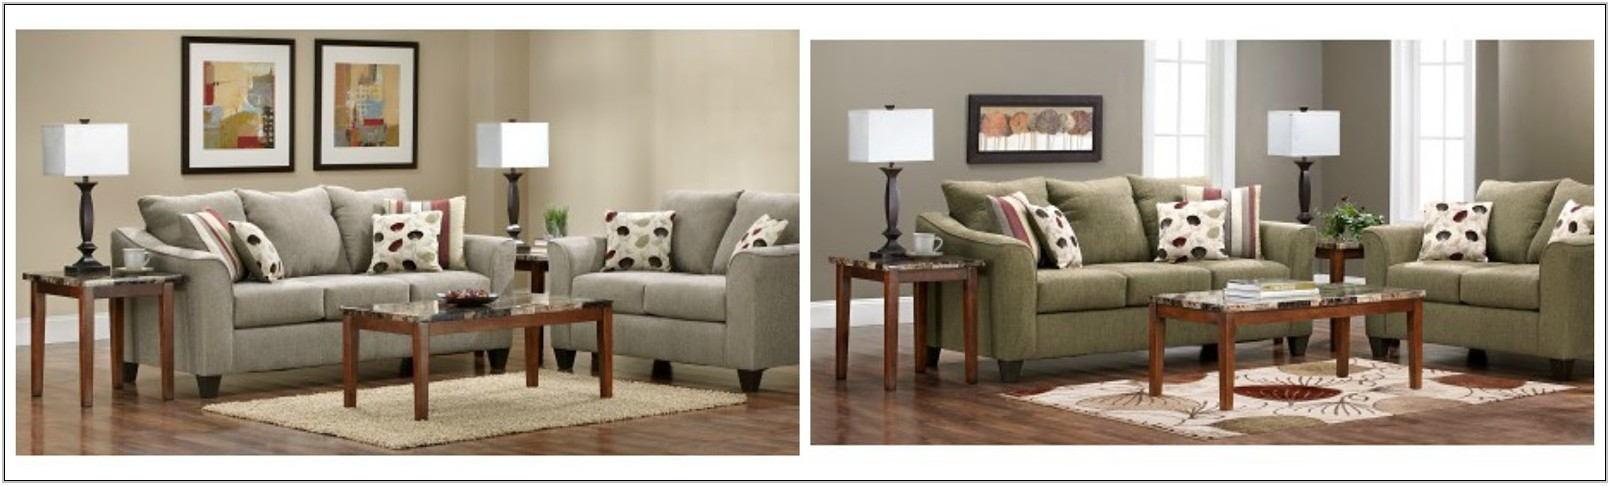 Slumberland Living Room Groups